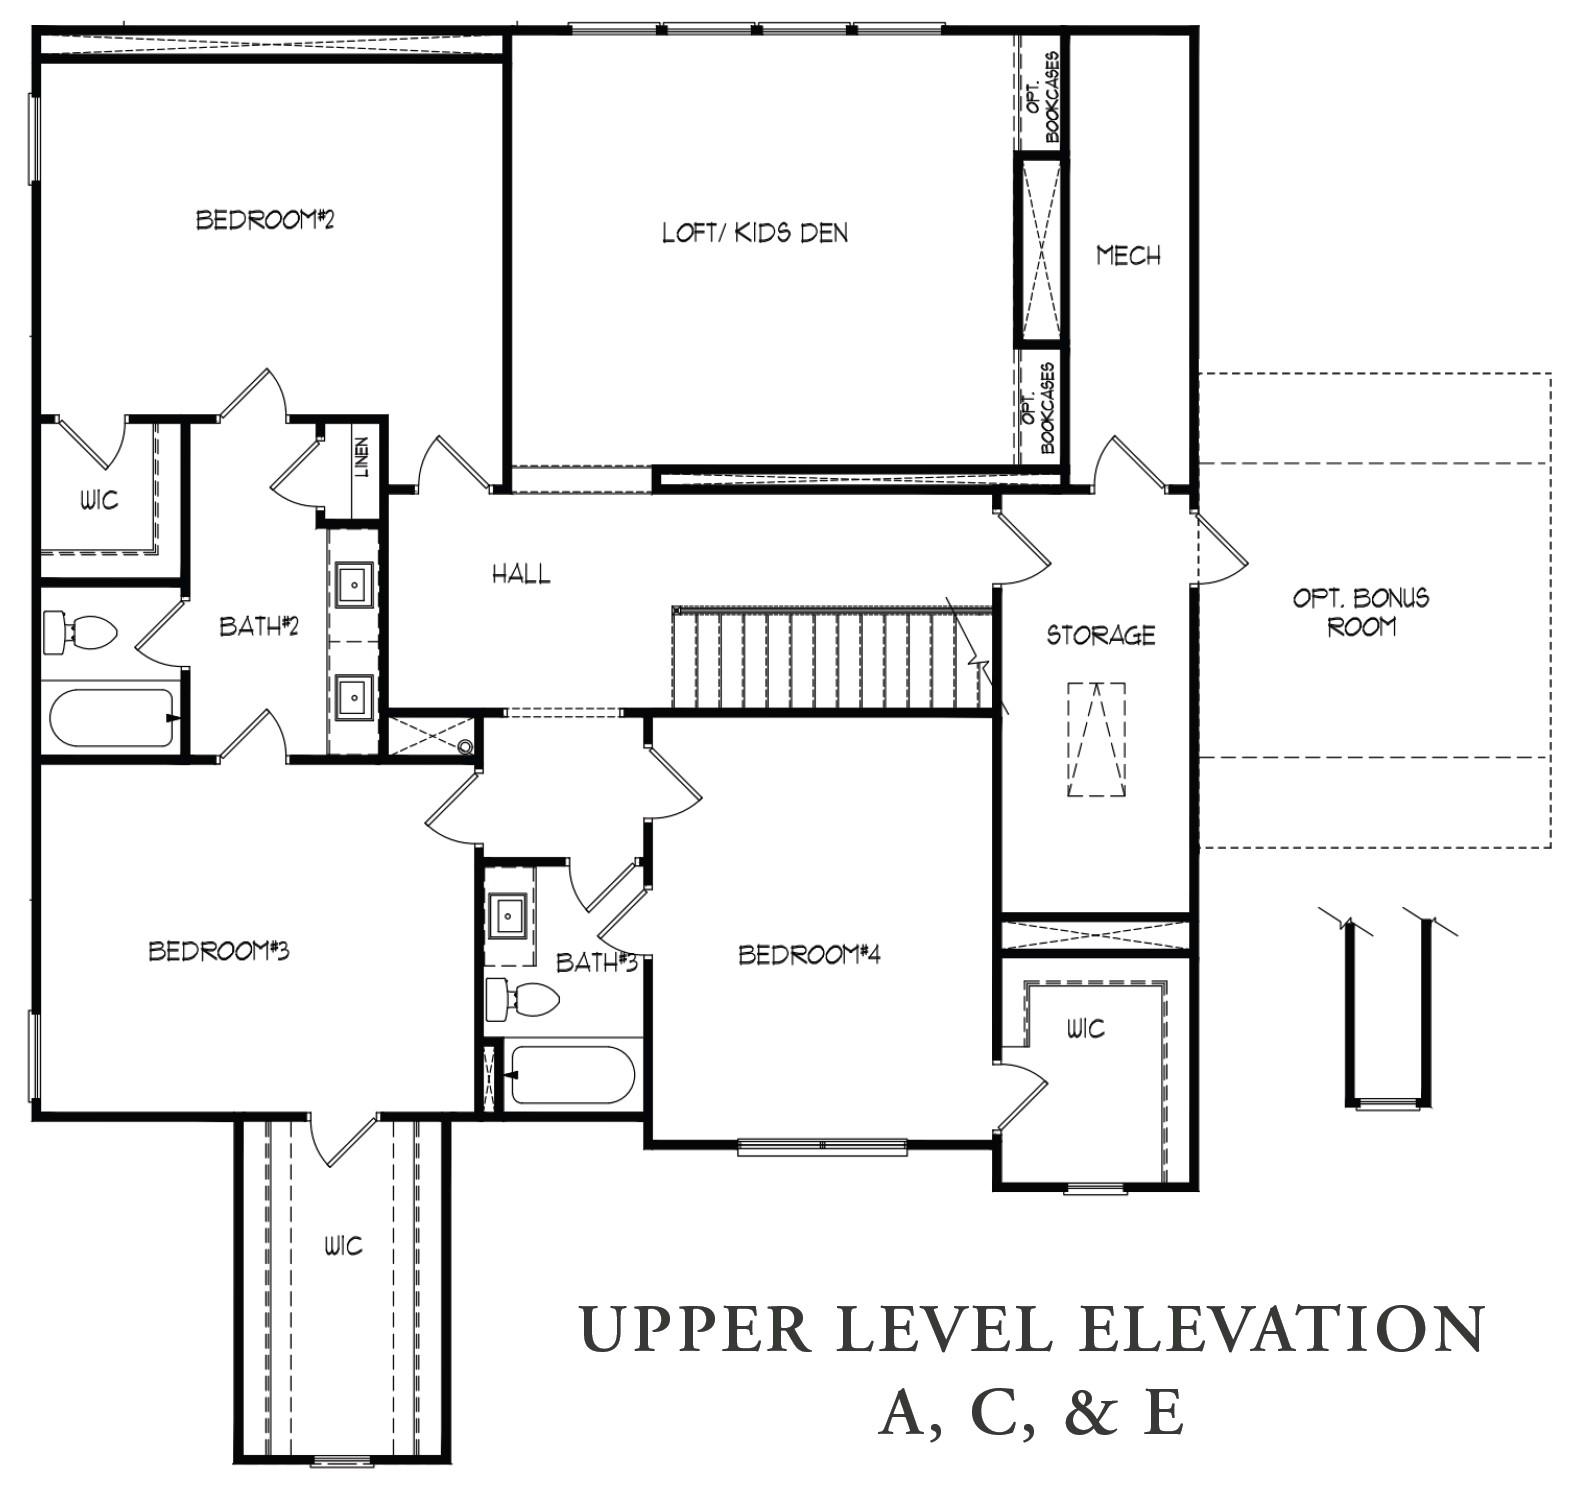 Upper Level A,C, & E